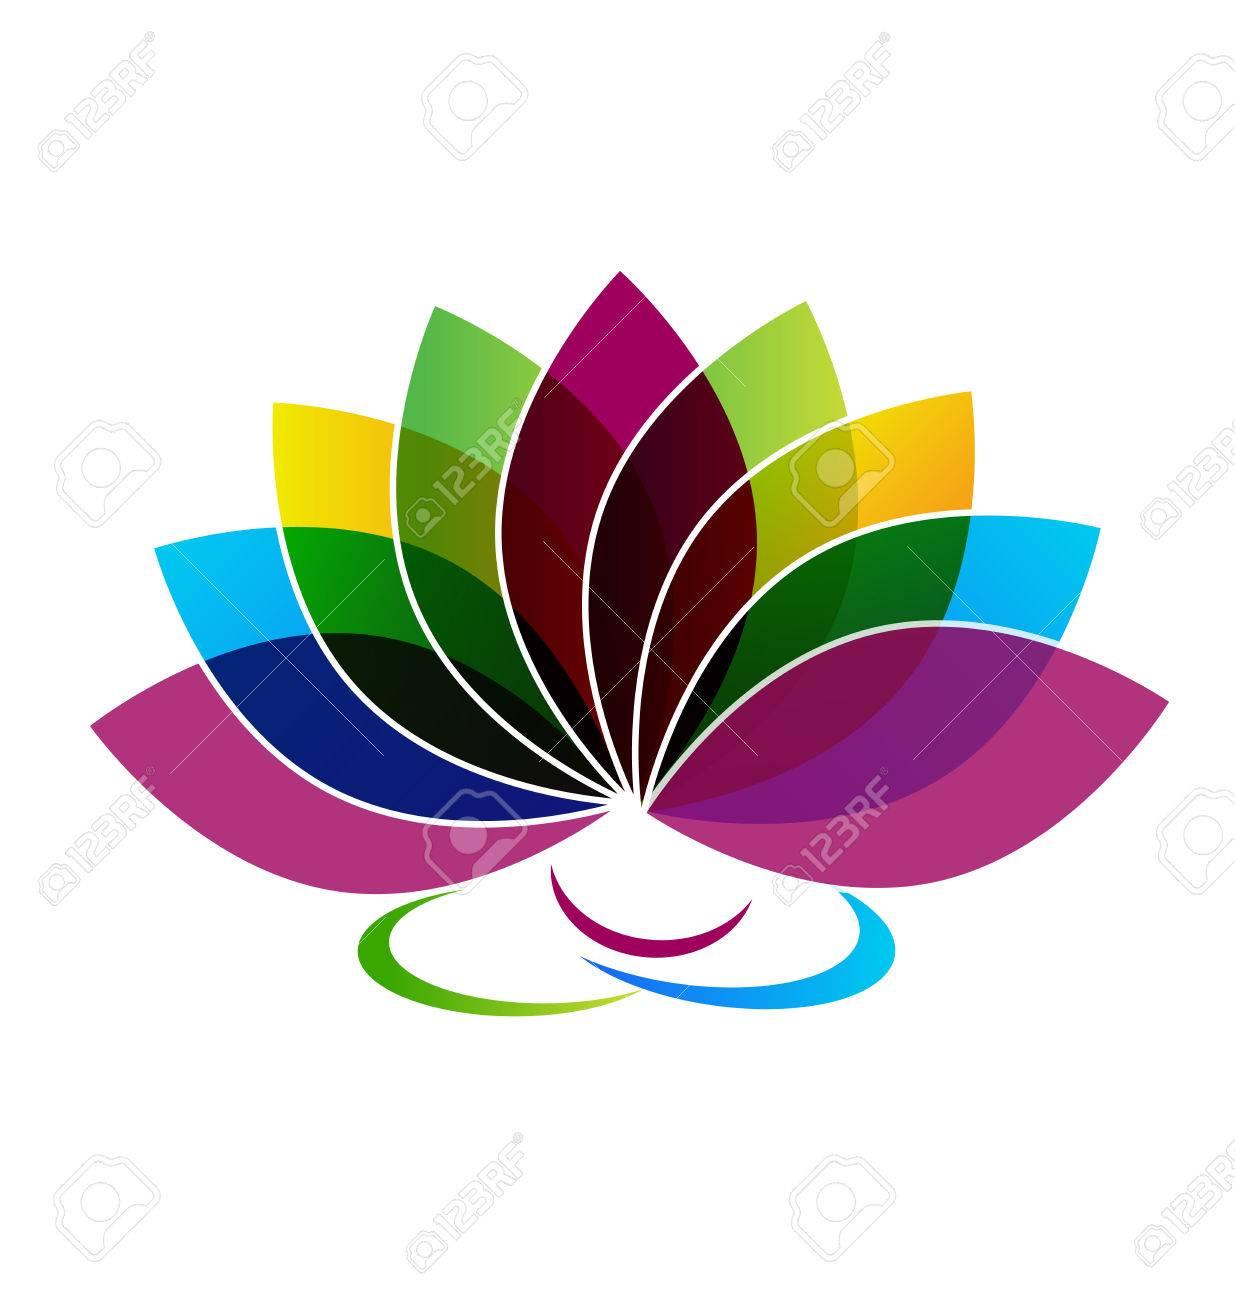 lotus flower identity card logo vector royalty free cliparts rh 123rf com  lotus flower logo design